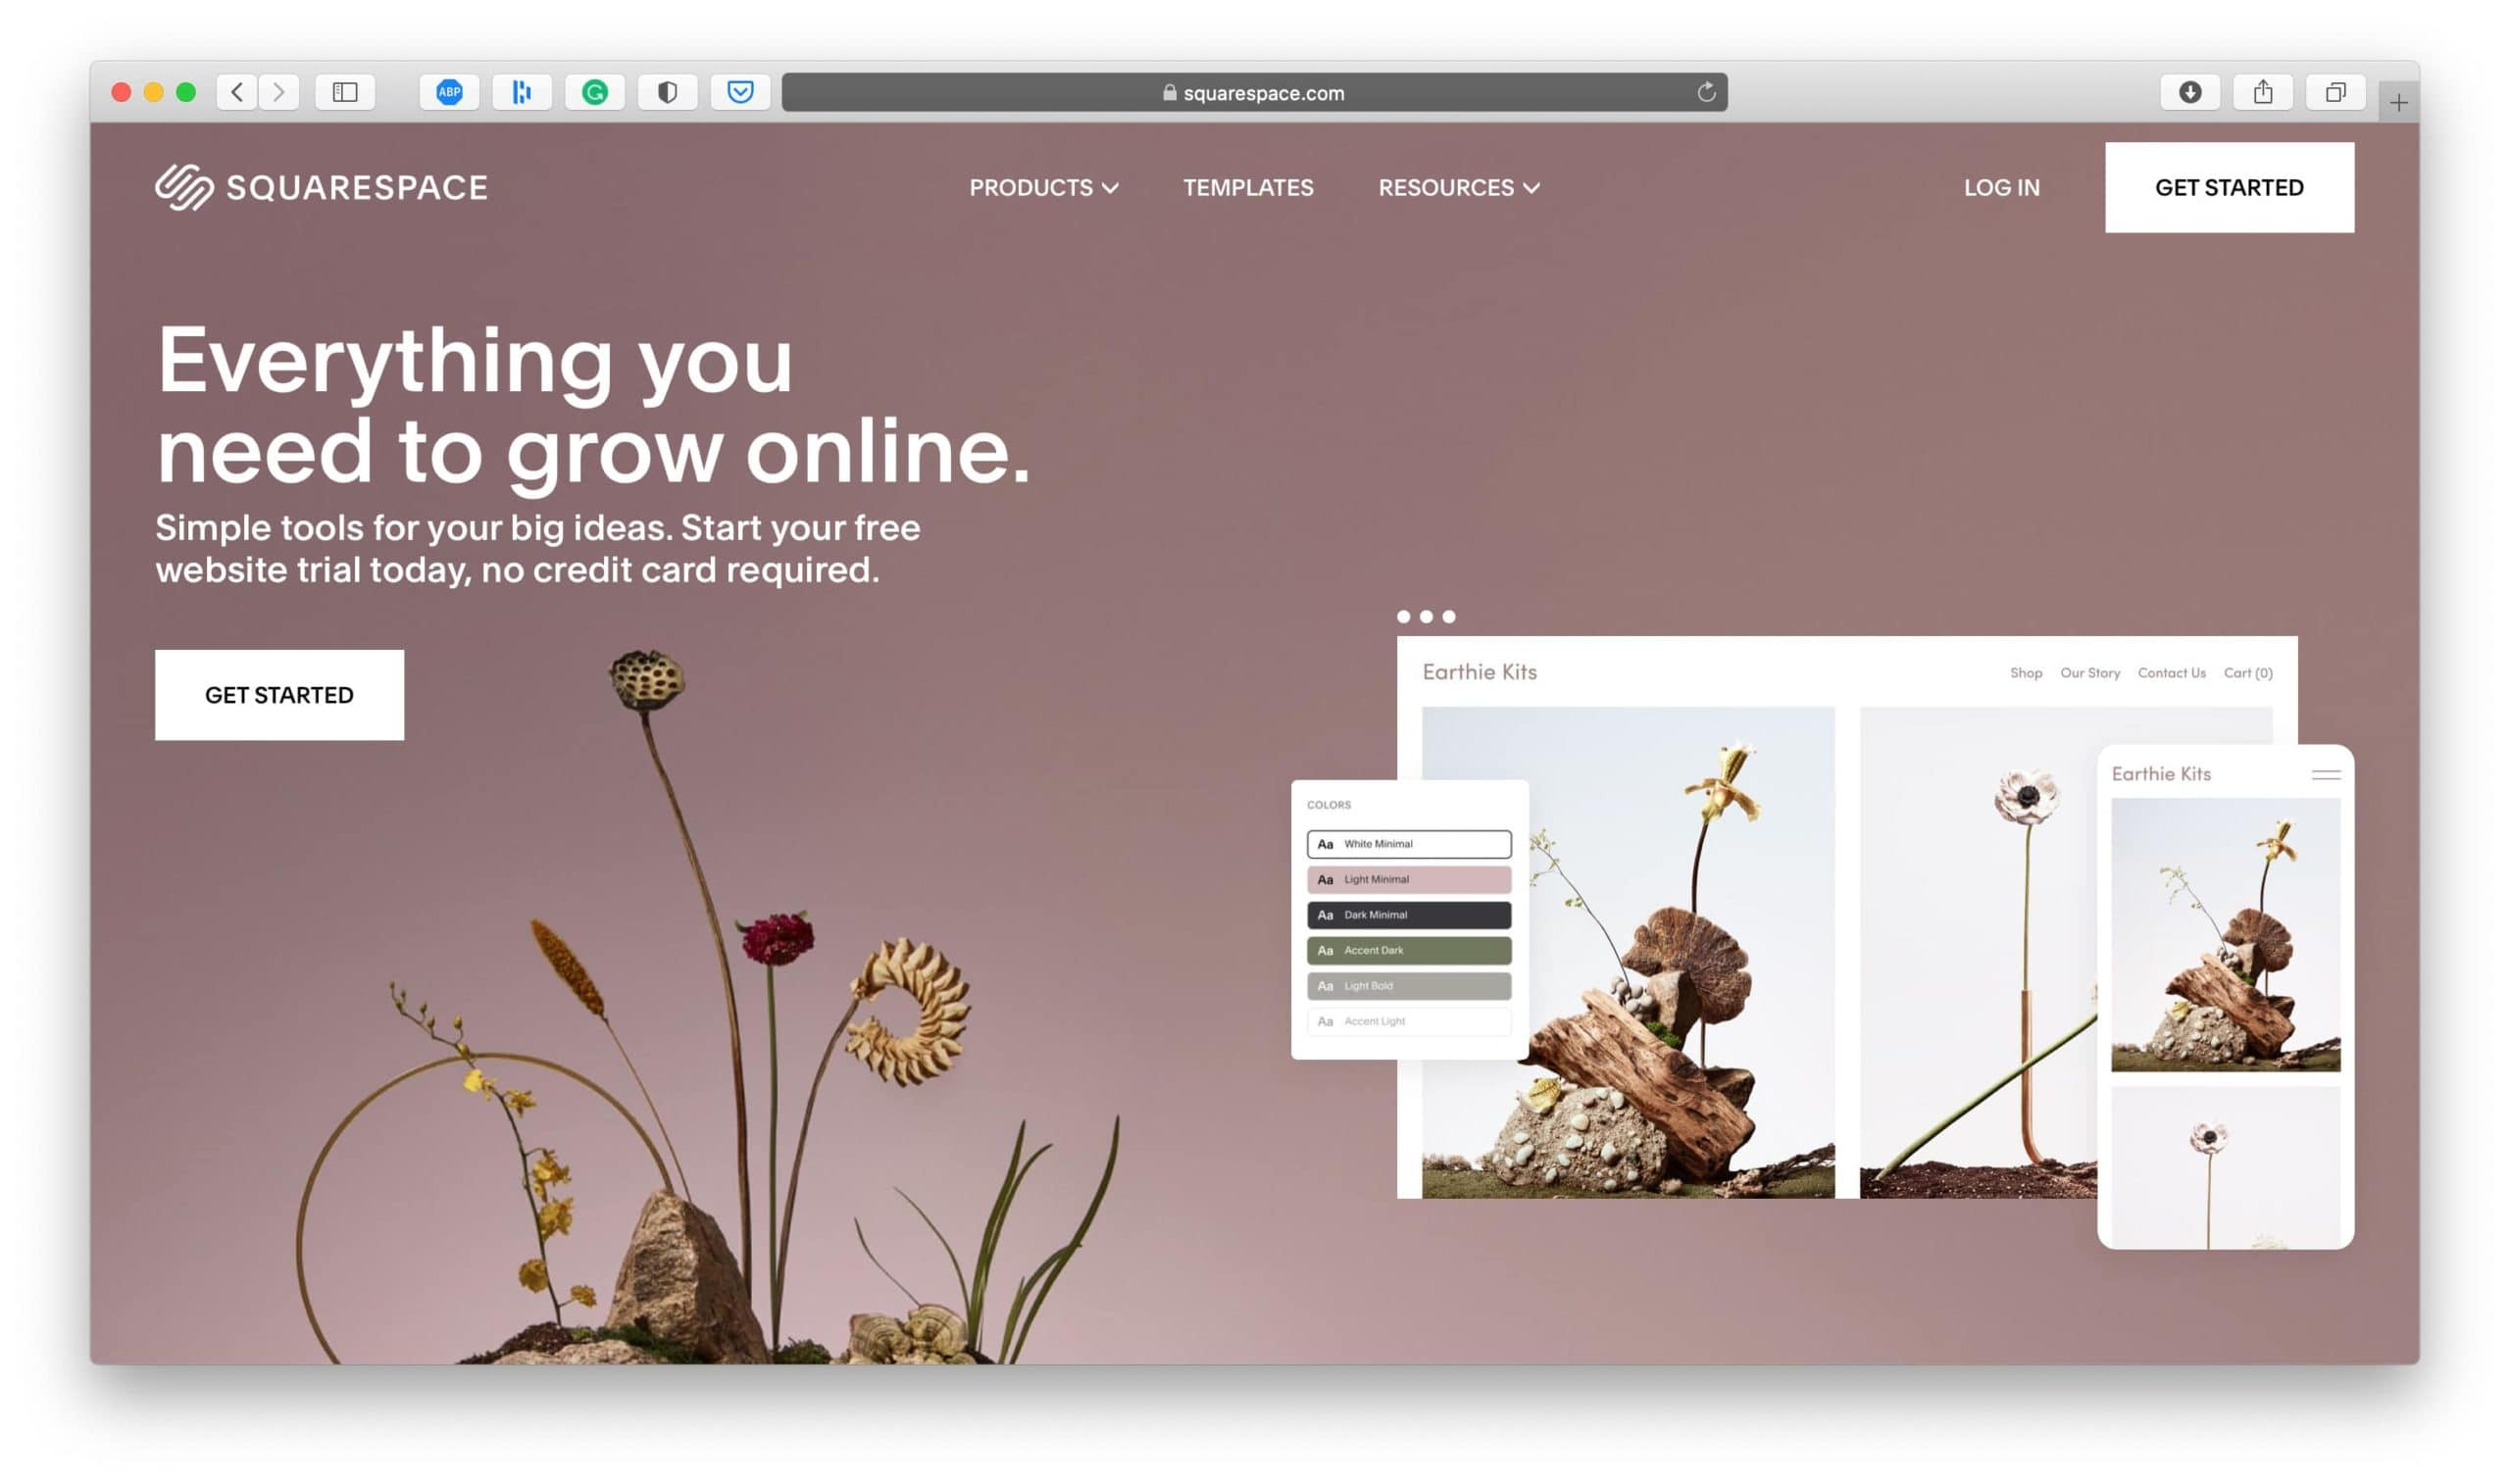 Squarespace Ecommerce Platform Homepage